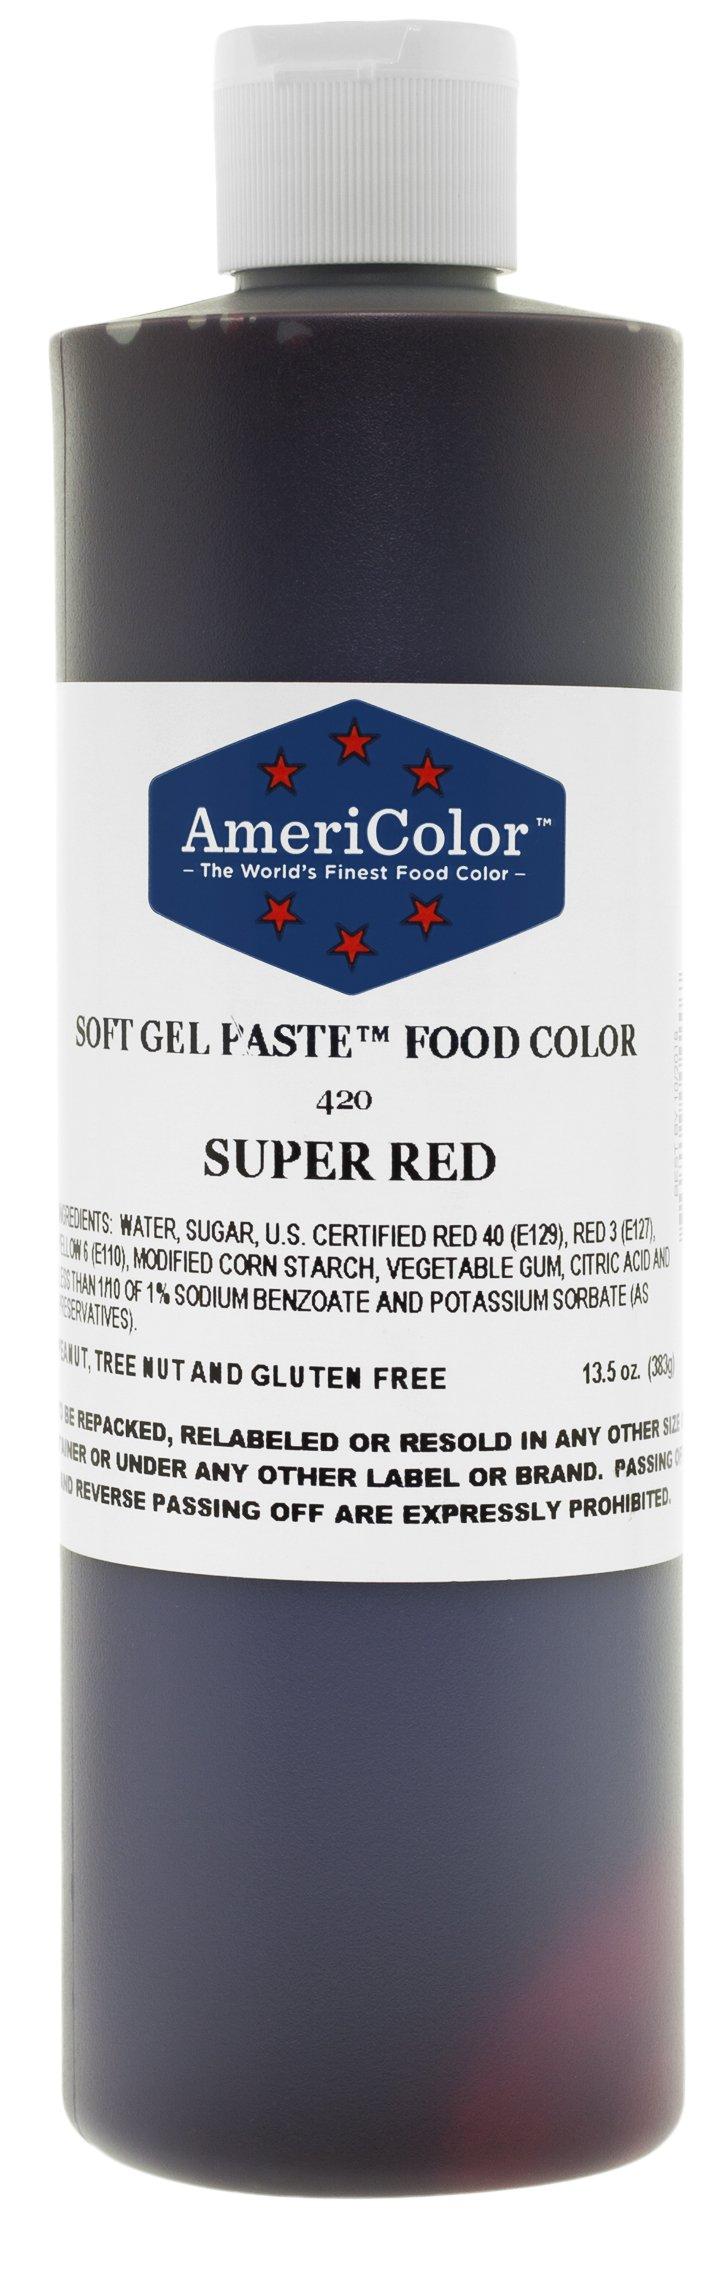 Americolor Food Color Super Red 13.5 Oz by AmeriColor